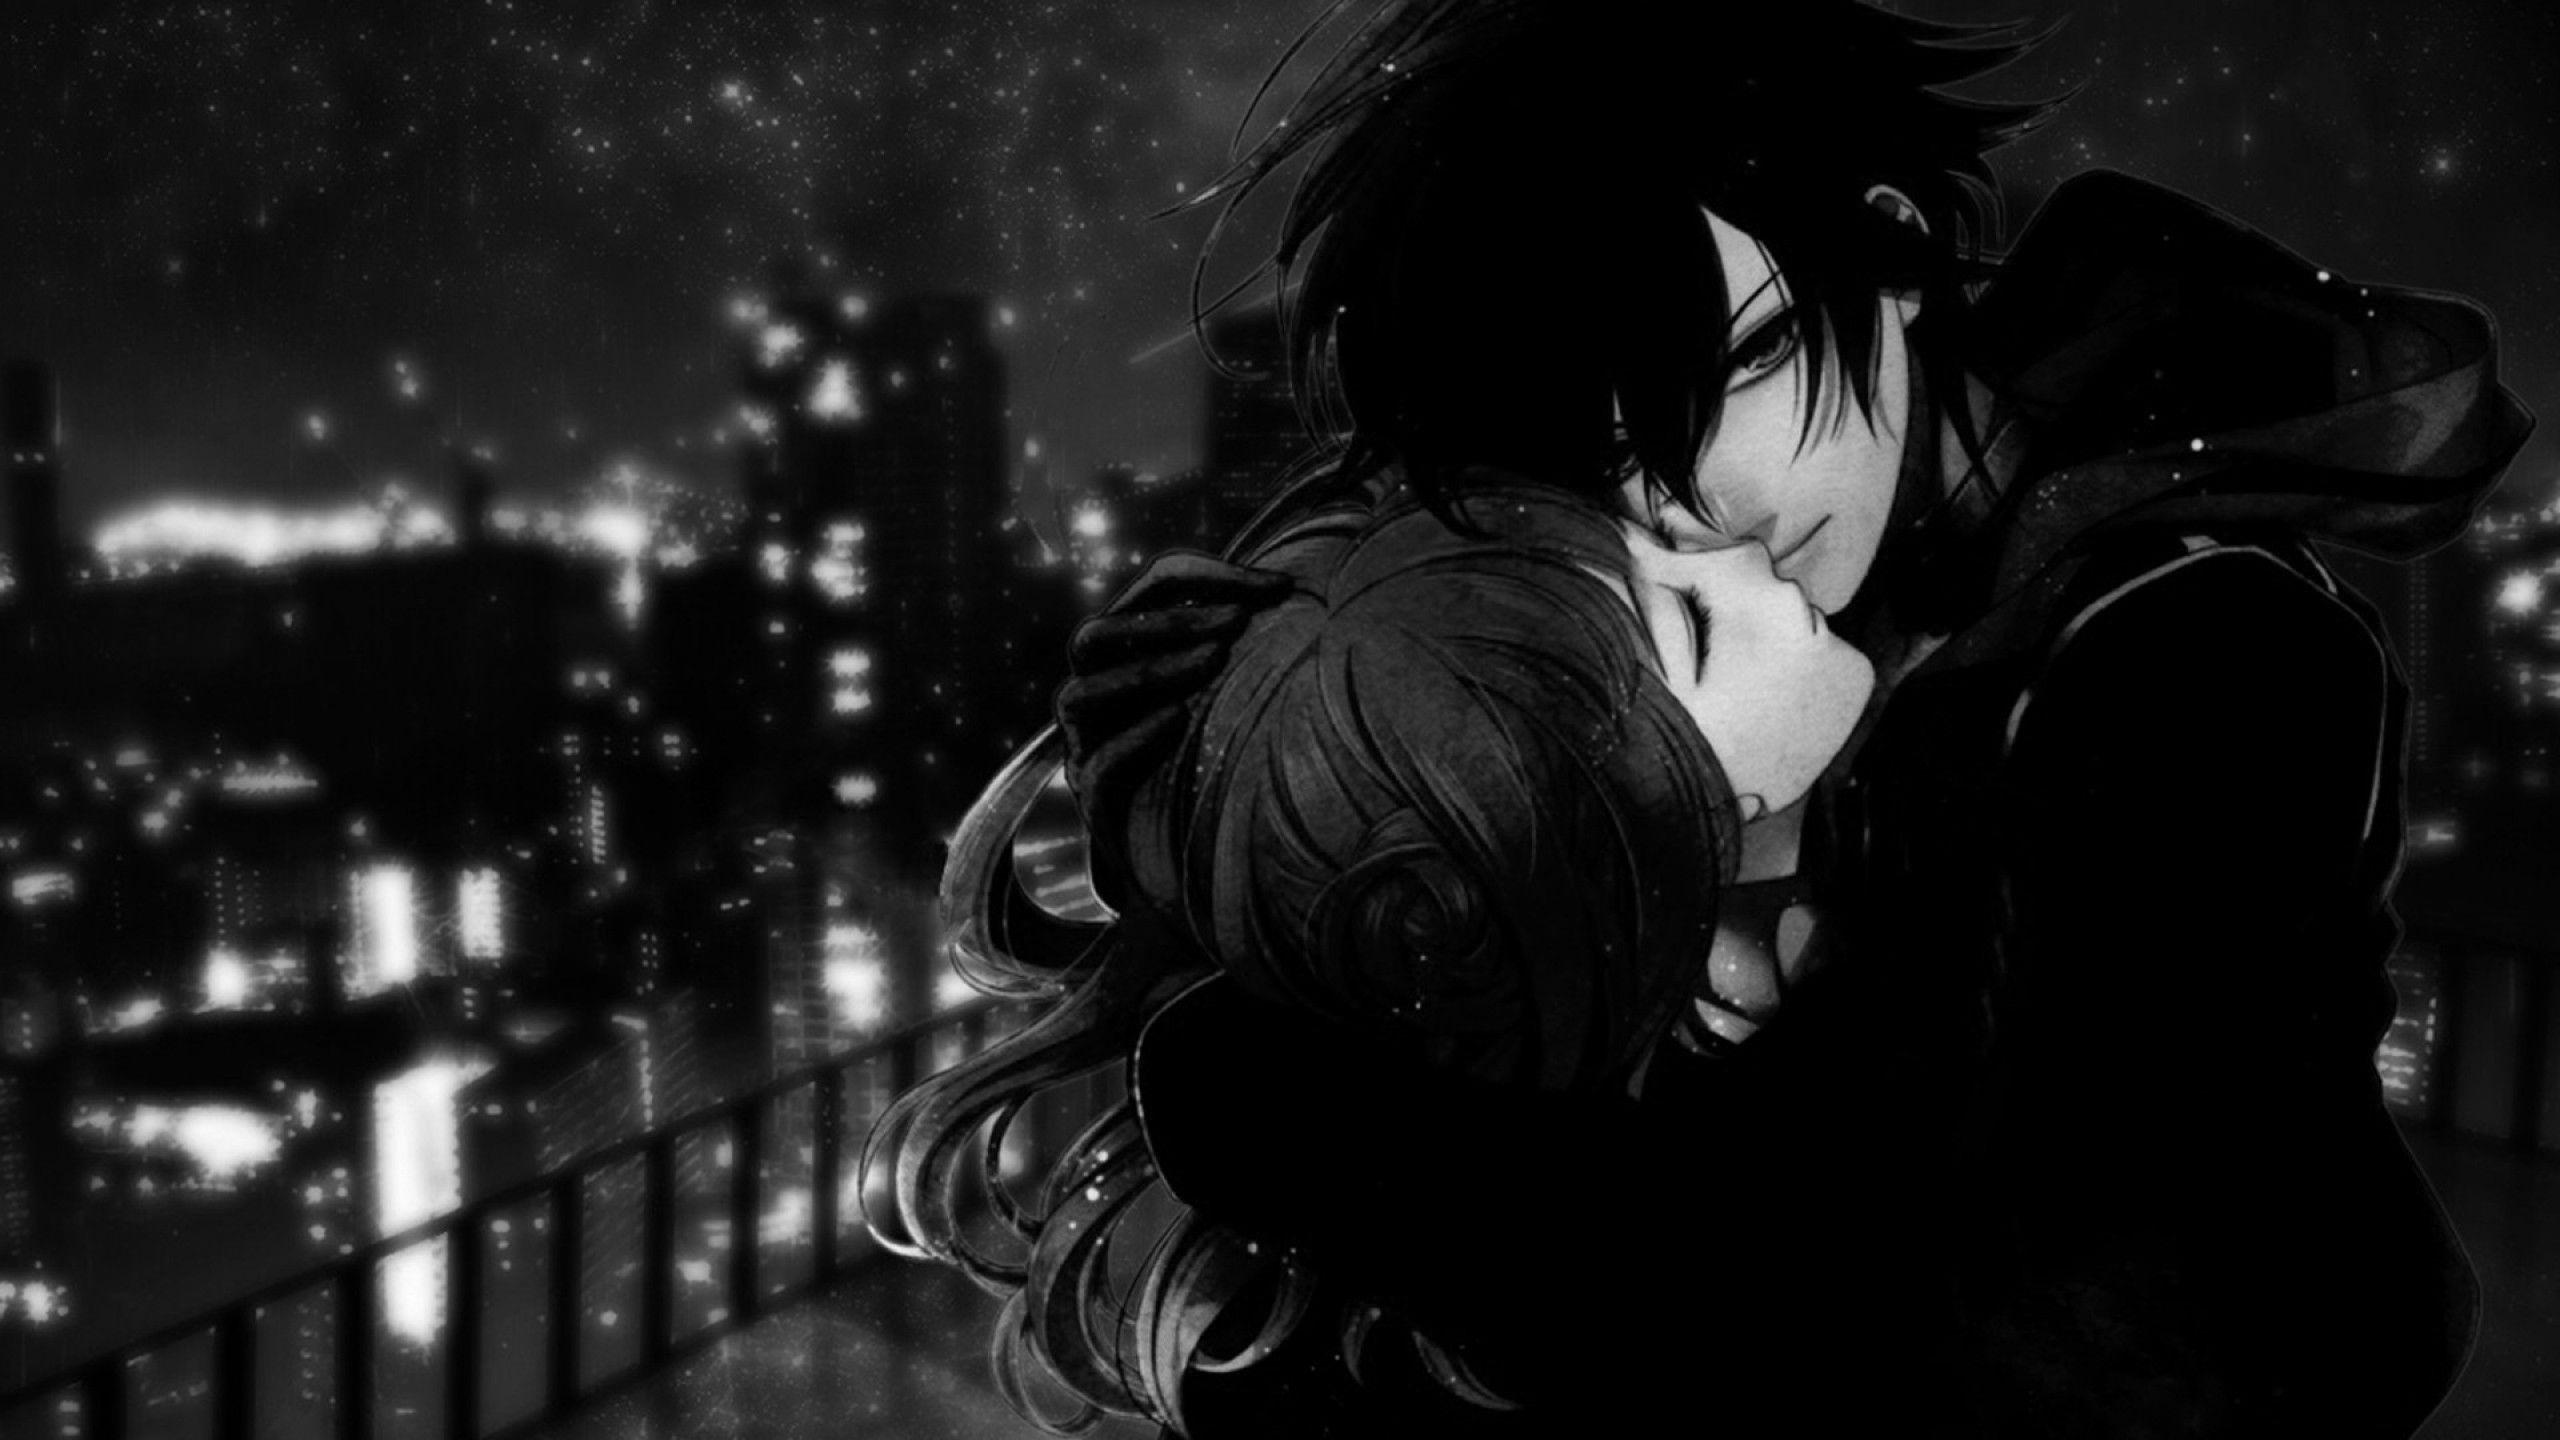 2560x1440 Black White Anime Love Picture 7454 Wallpaper Chibi